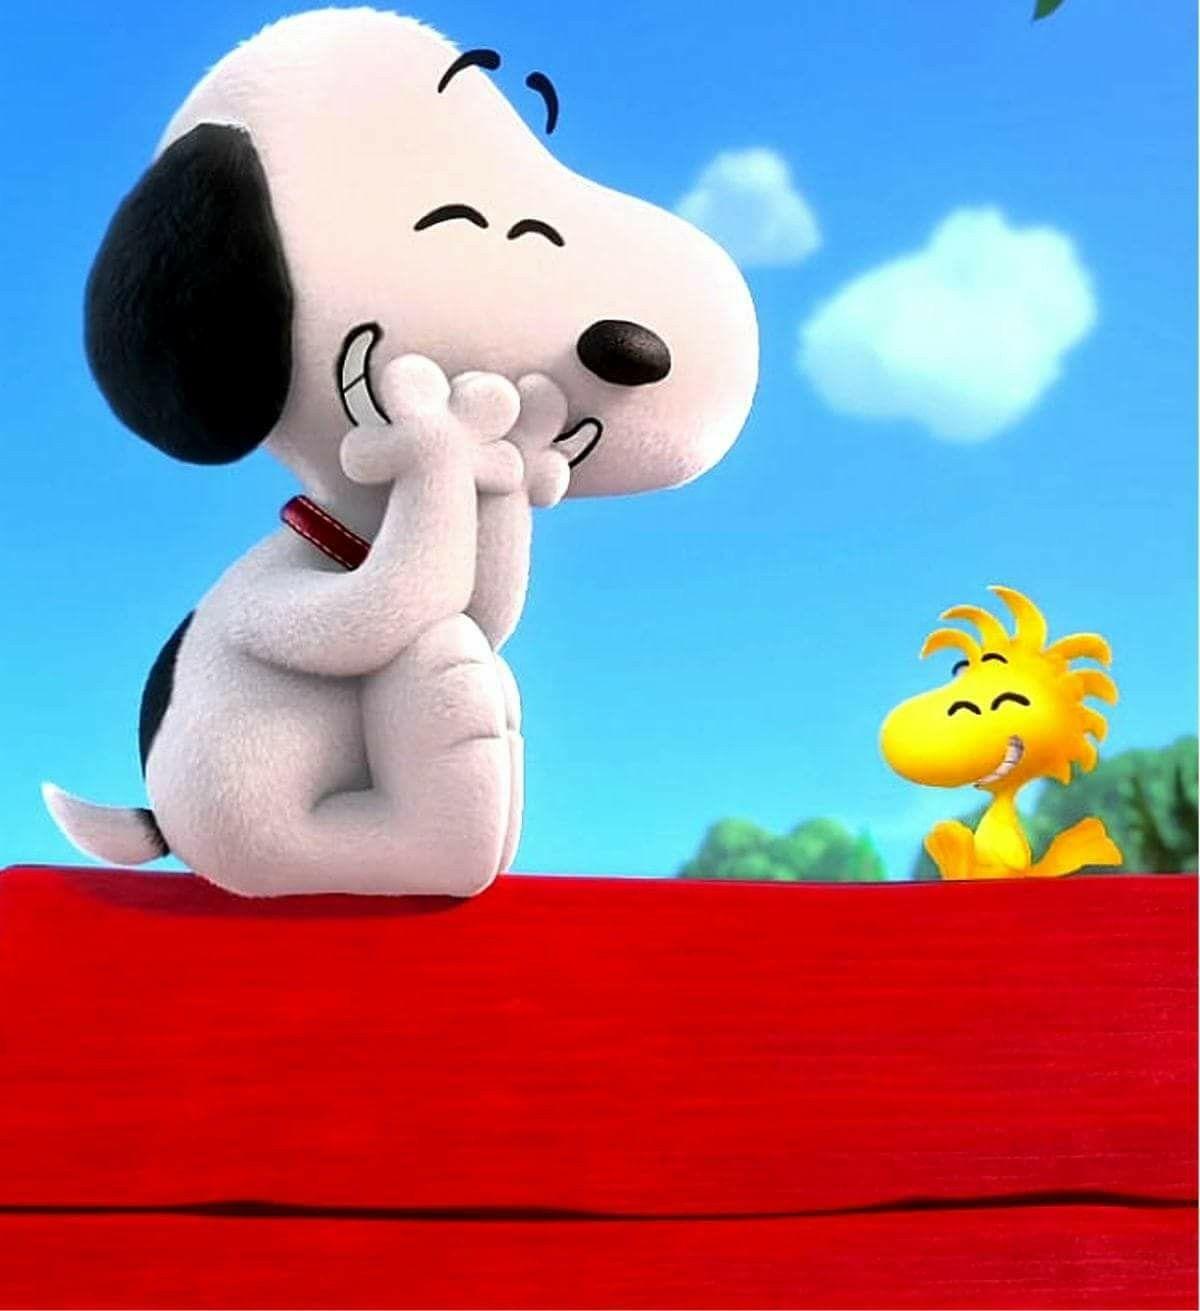 Pin de 🎭 MaryAnn en Charlie Brown & Snoopy | Pinterest